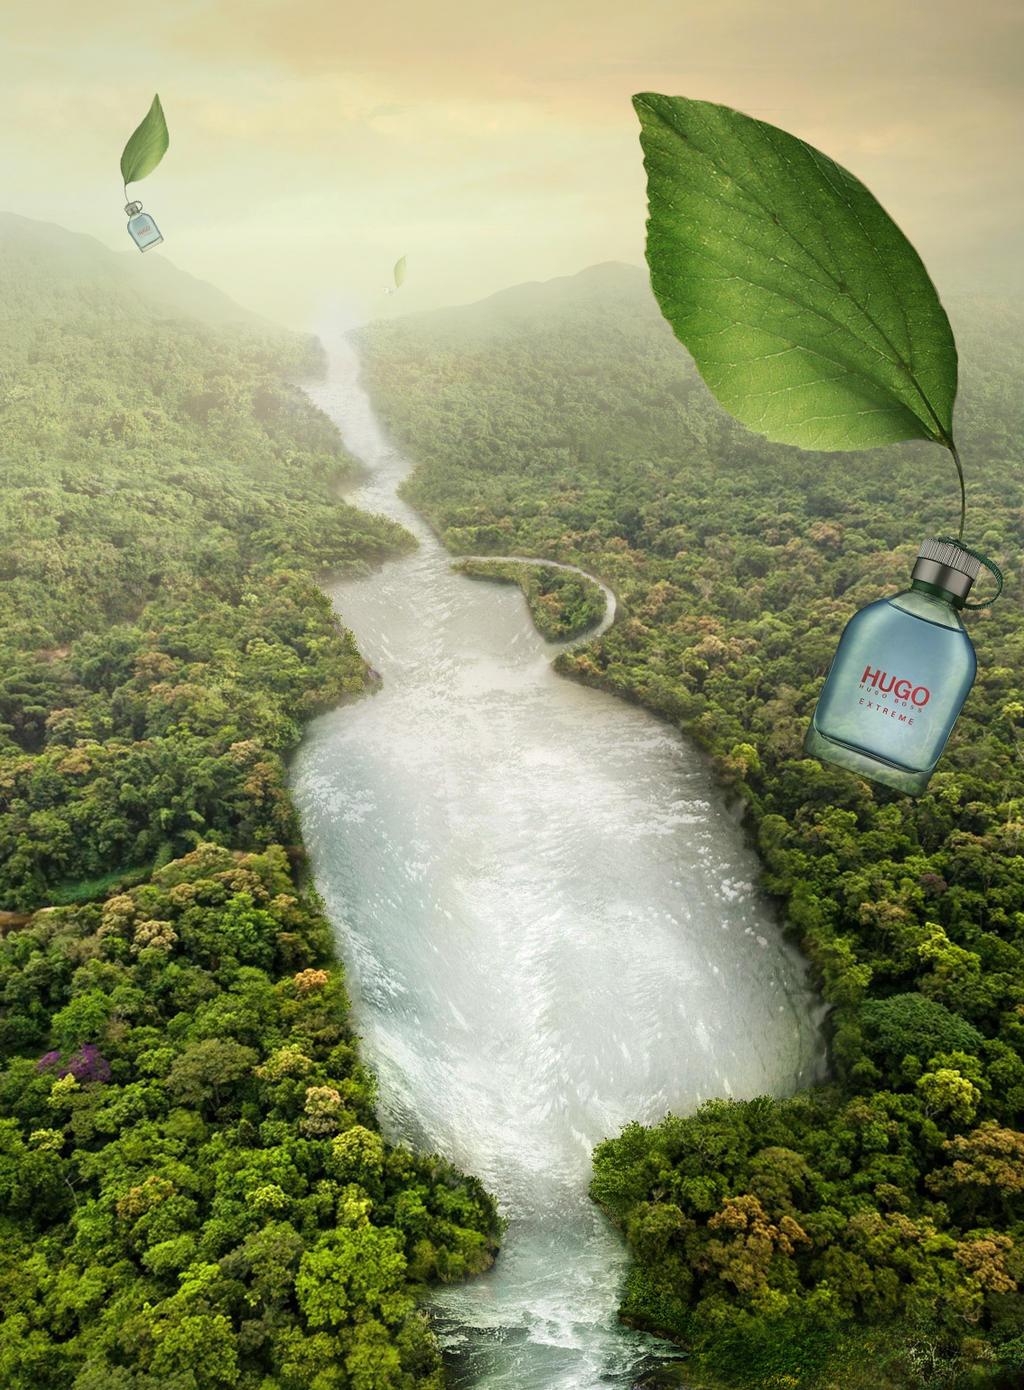 Hugo2- One Fragrance, One Tree